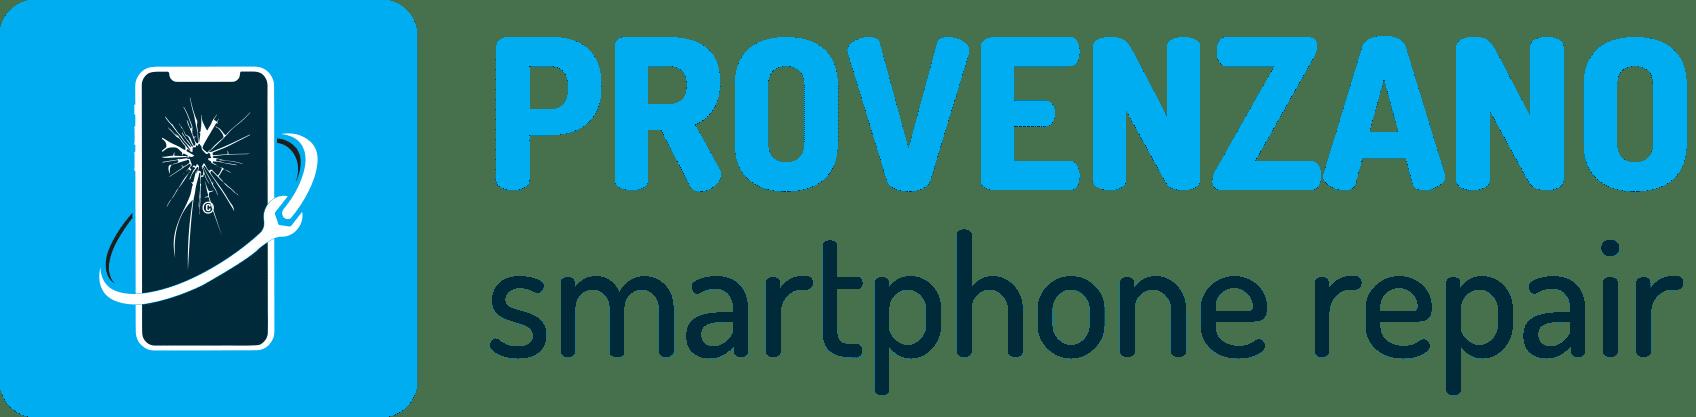 Provenzano Smartphone Repair